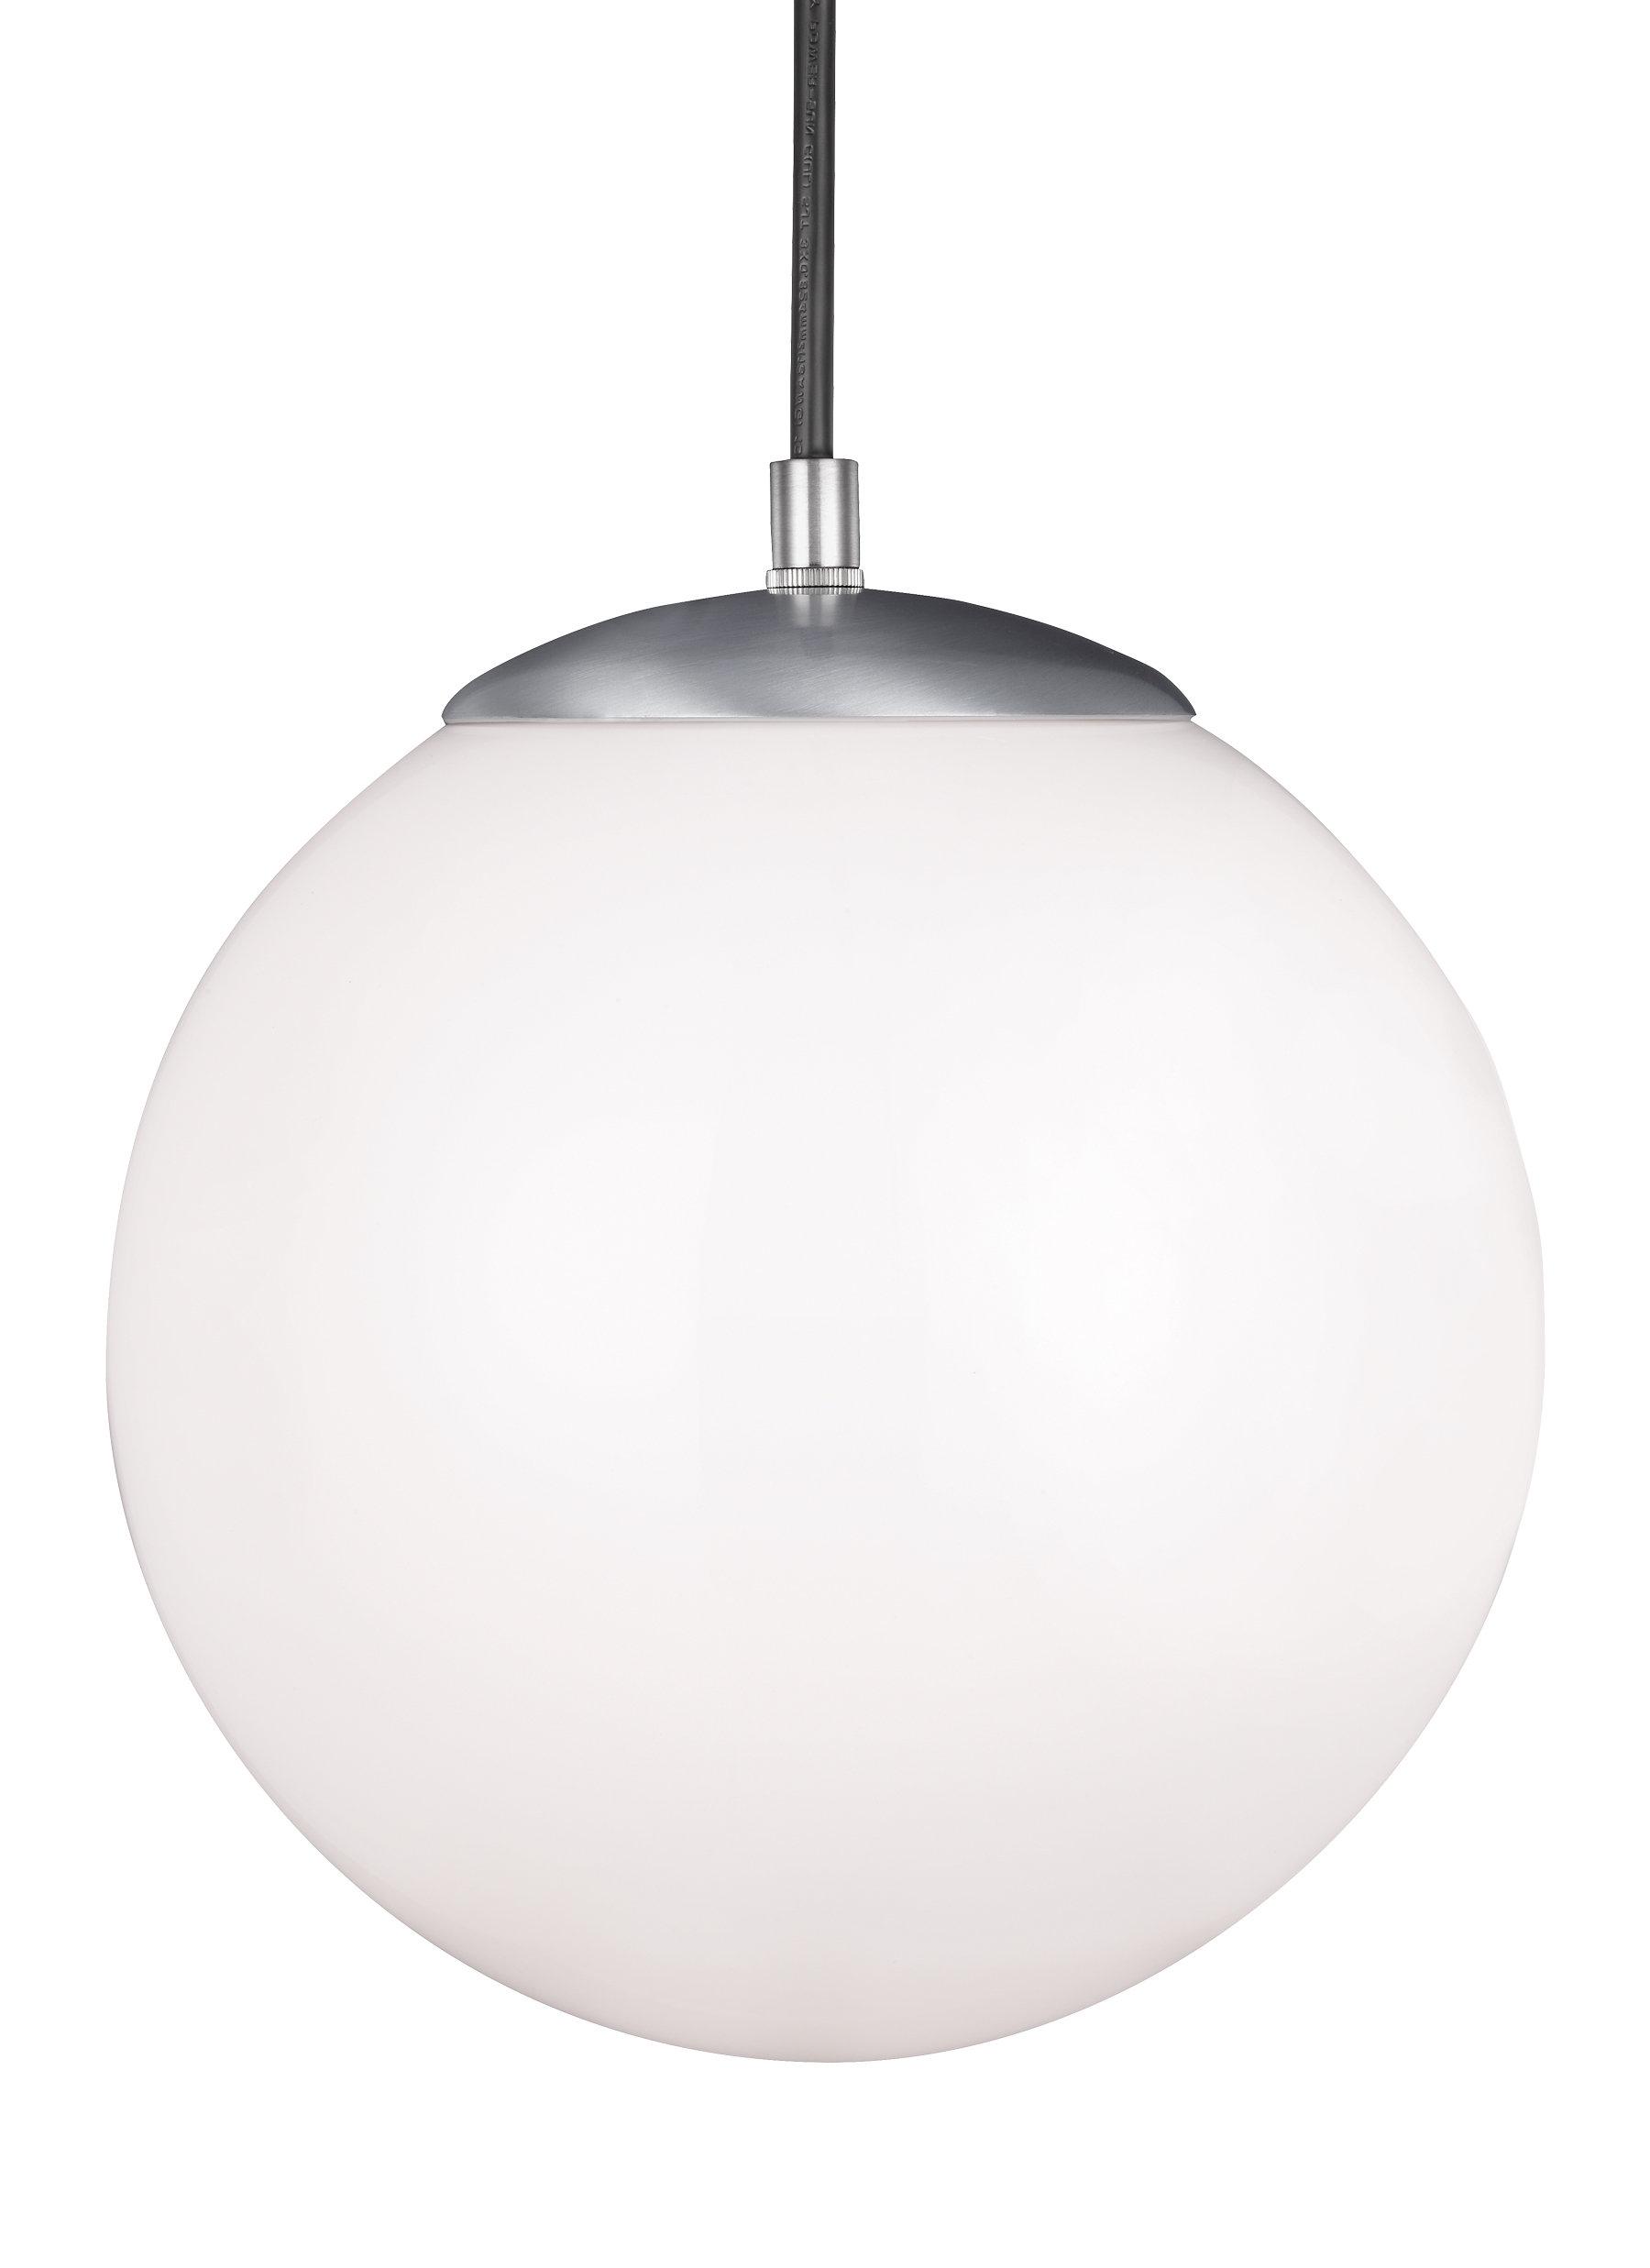 Best and Newest Quinn 1-Light Led Globe Pendant pertaining to Bautista 1-Light Single Globe Pendants